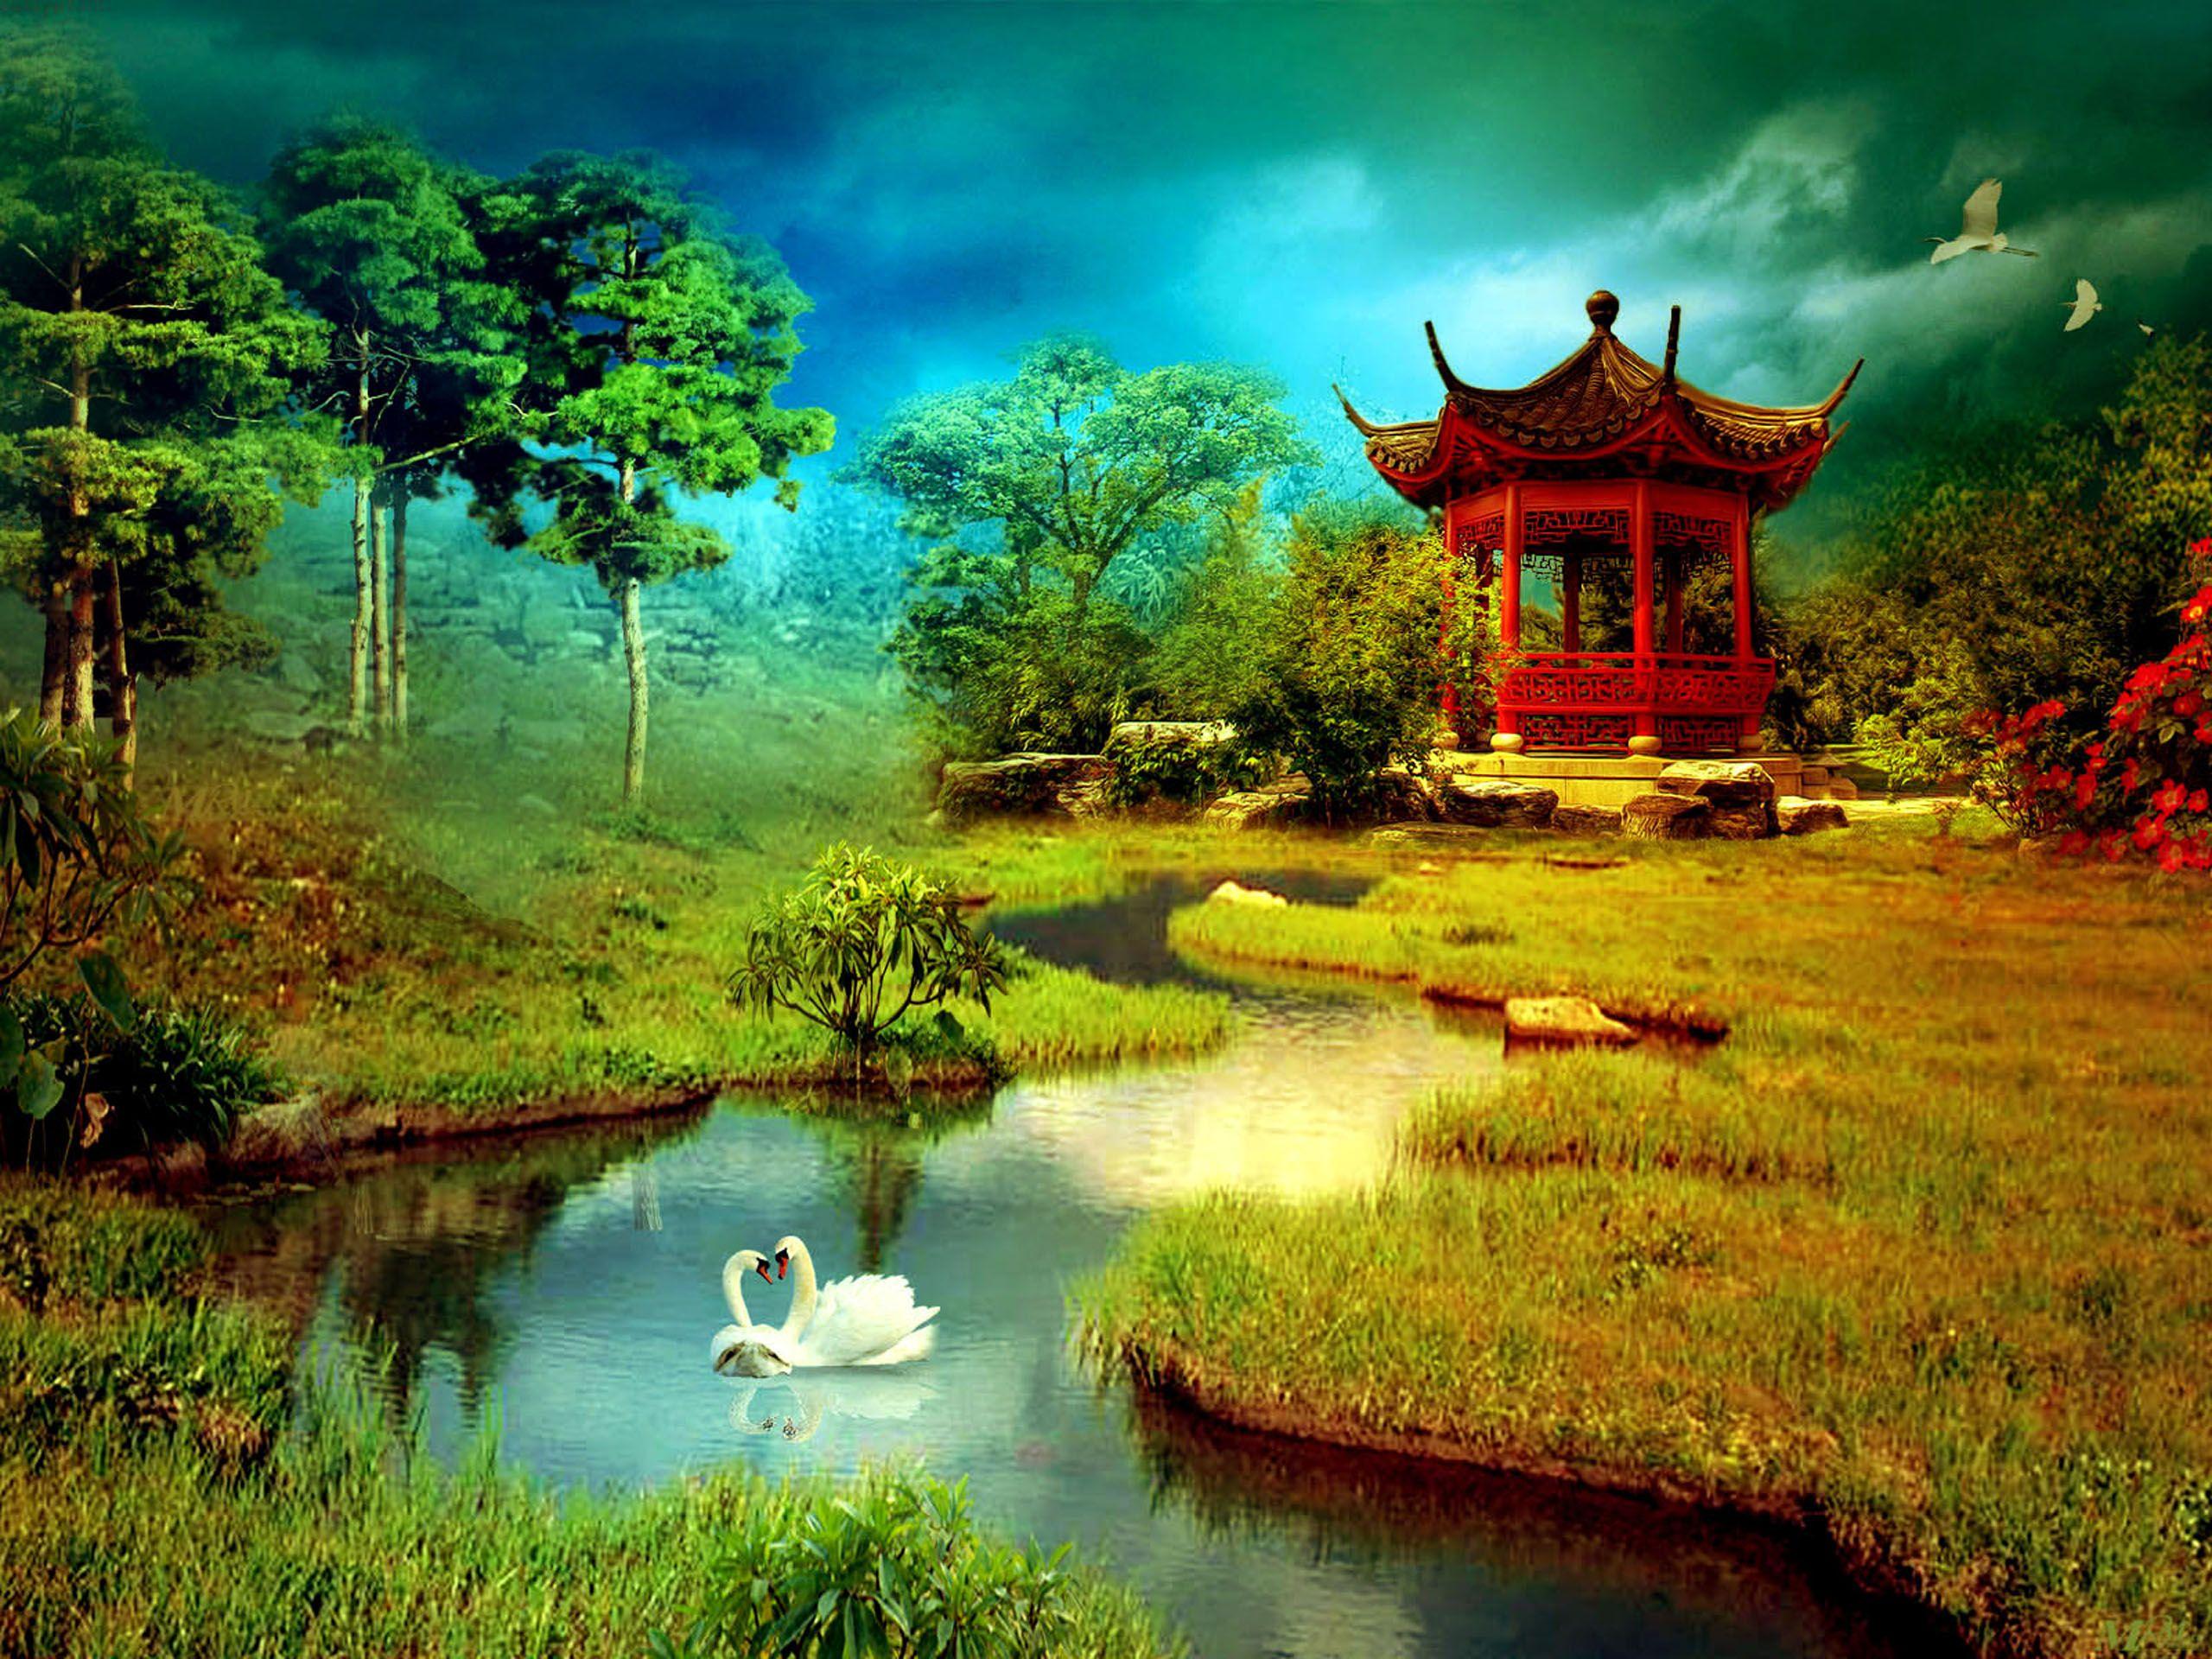 Free Best Wallpaper Com Beautiful Images Nature 3d Nature Wallpaper Beautiful Nature Wallpaper